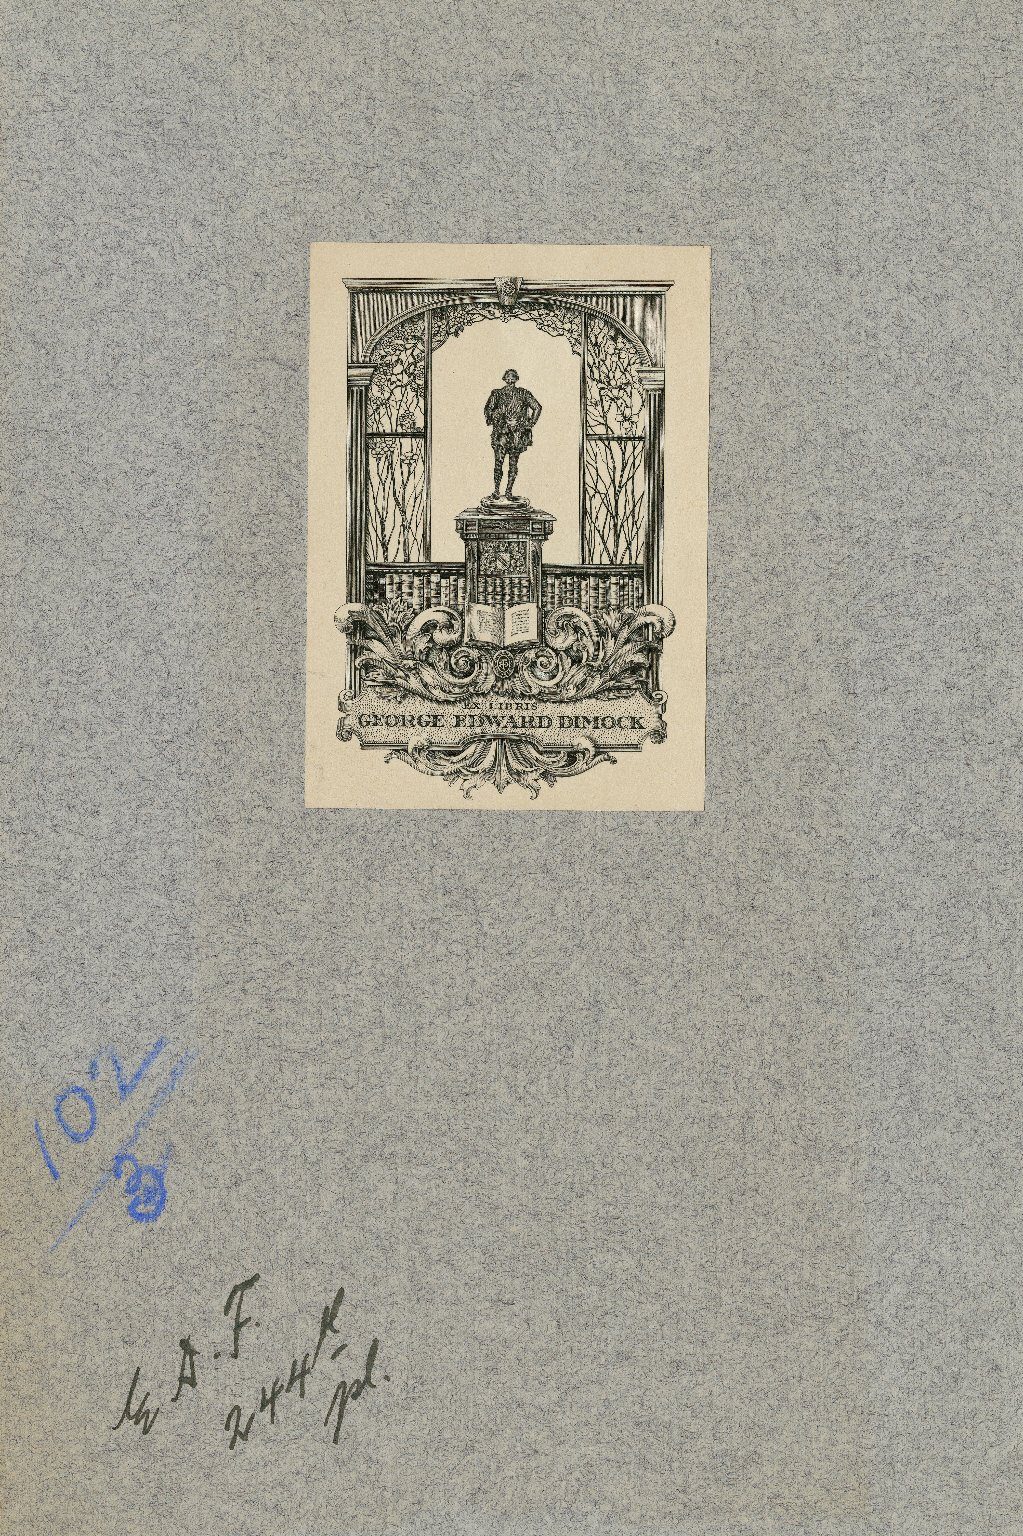 Ex libris George Edward Dimock [graphic].